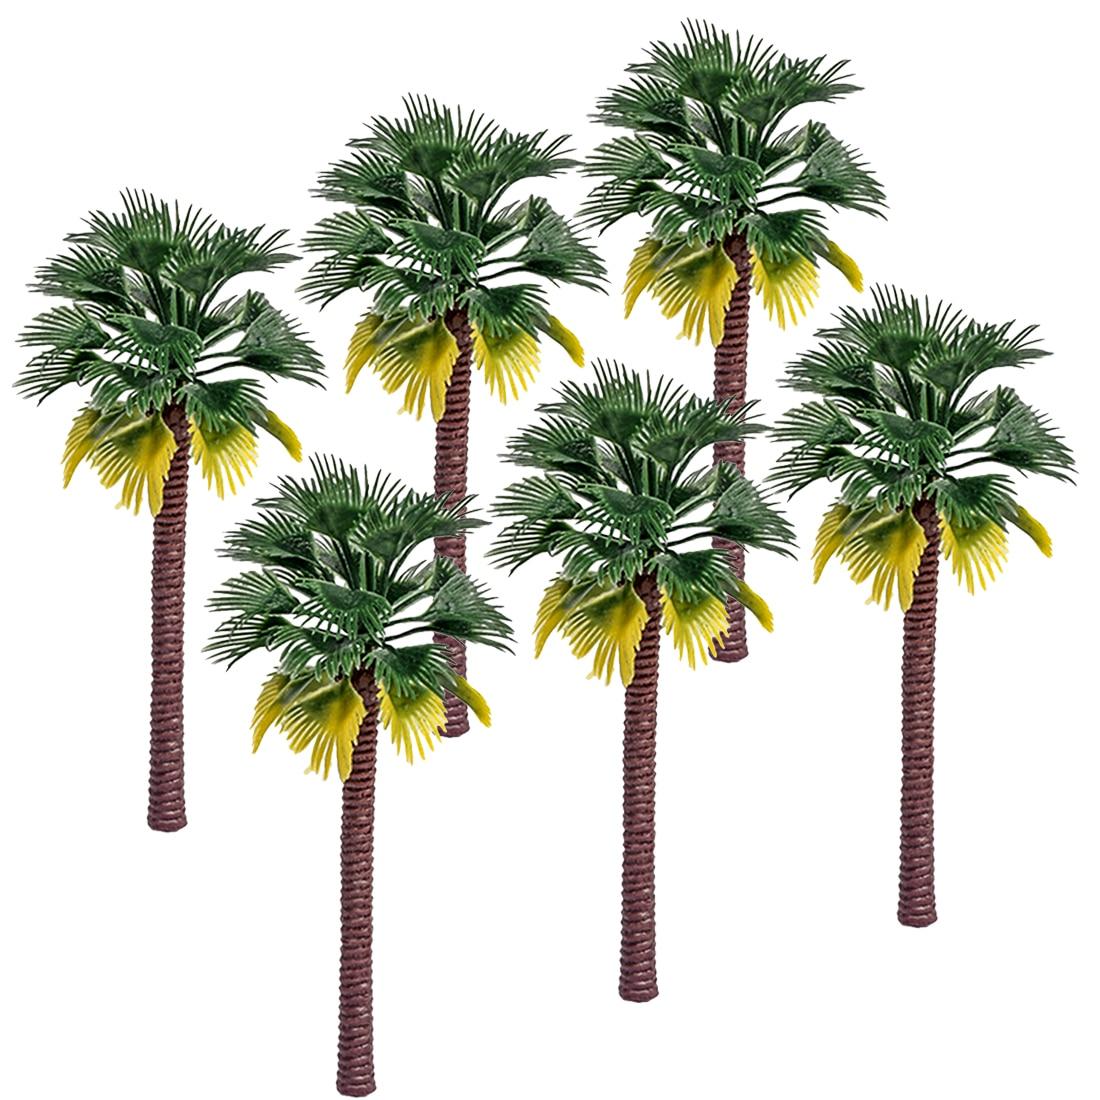 6 Pcs/Lot 12cm Plastic Coconut Palm Tree Train Railroad Architecture Diorama Tree Model Kits Toys Accessories Drop Shipping New